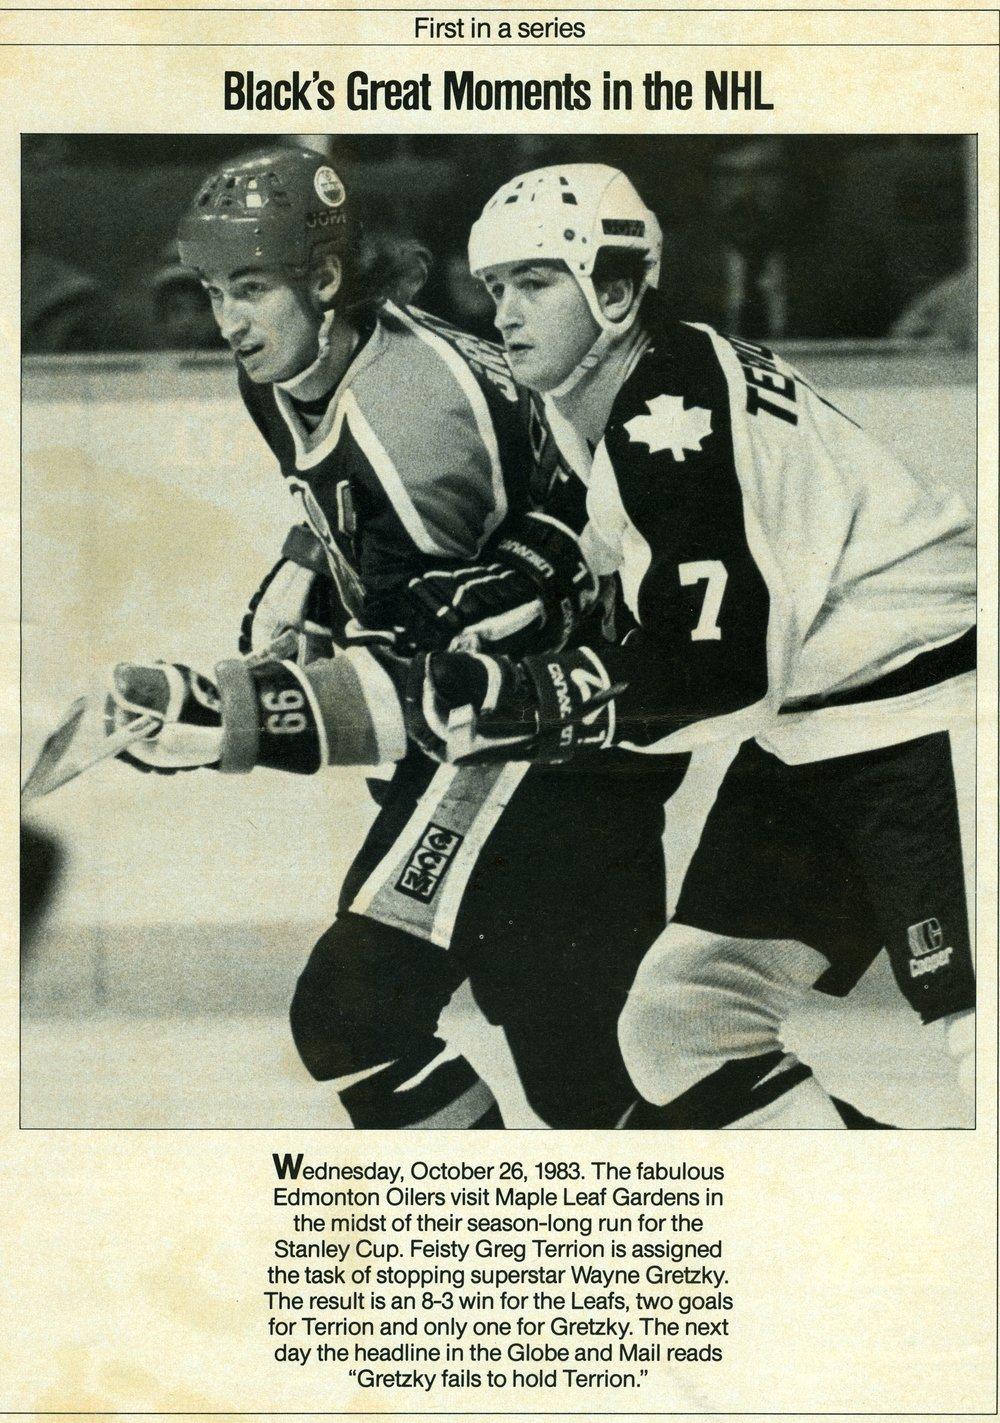 Greg Terrion-Wayne Gretzky 1983